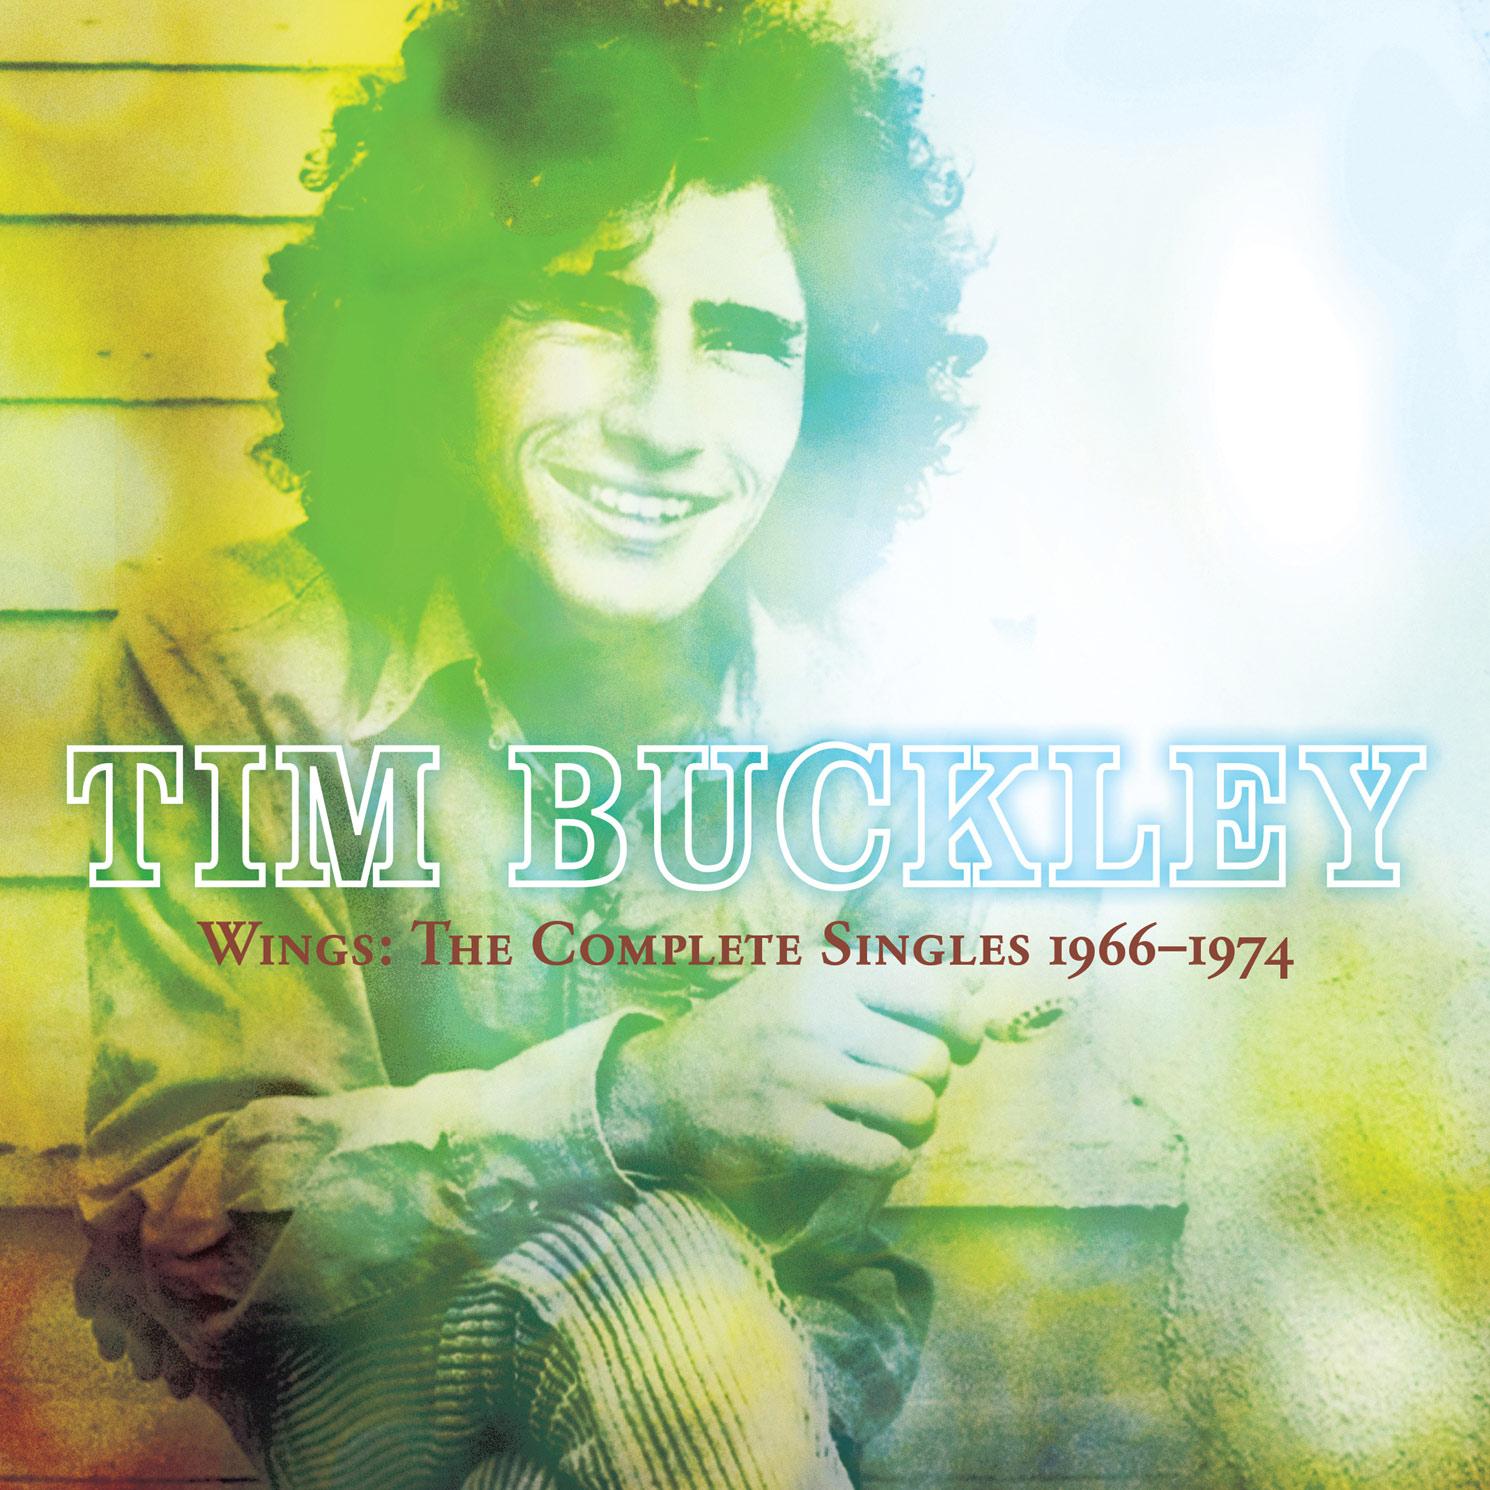 Tim Buckley-  Wings: The Complete Singles 1966–1974  Release Date: November 18, 2016 Label: Omnivore Recordings  SERVICE: Restoration, Mastering NUMBER OF DISCS: 1 GENRE: Rock FORMAT: CD